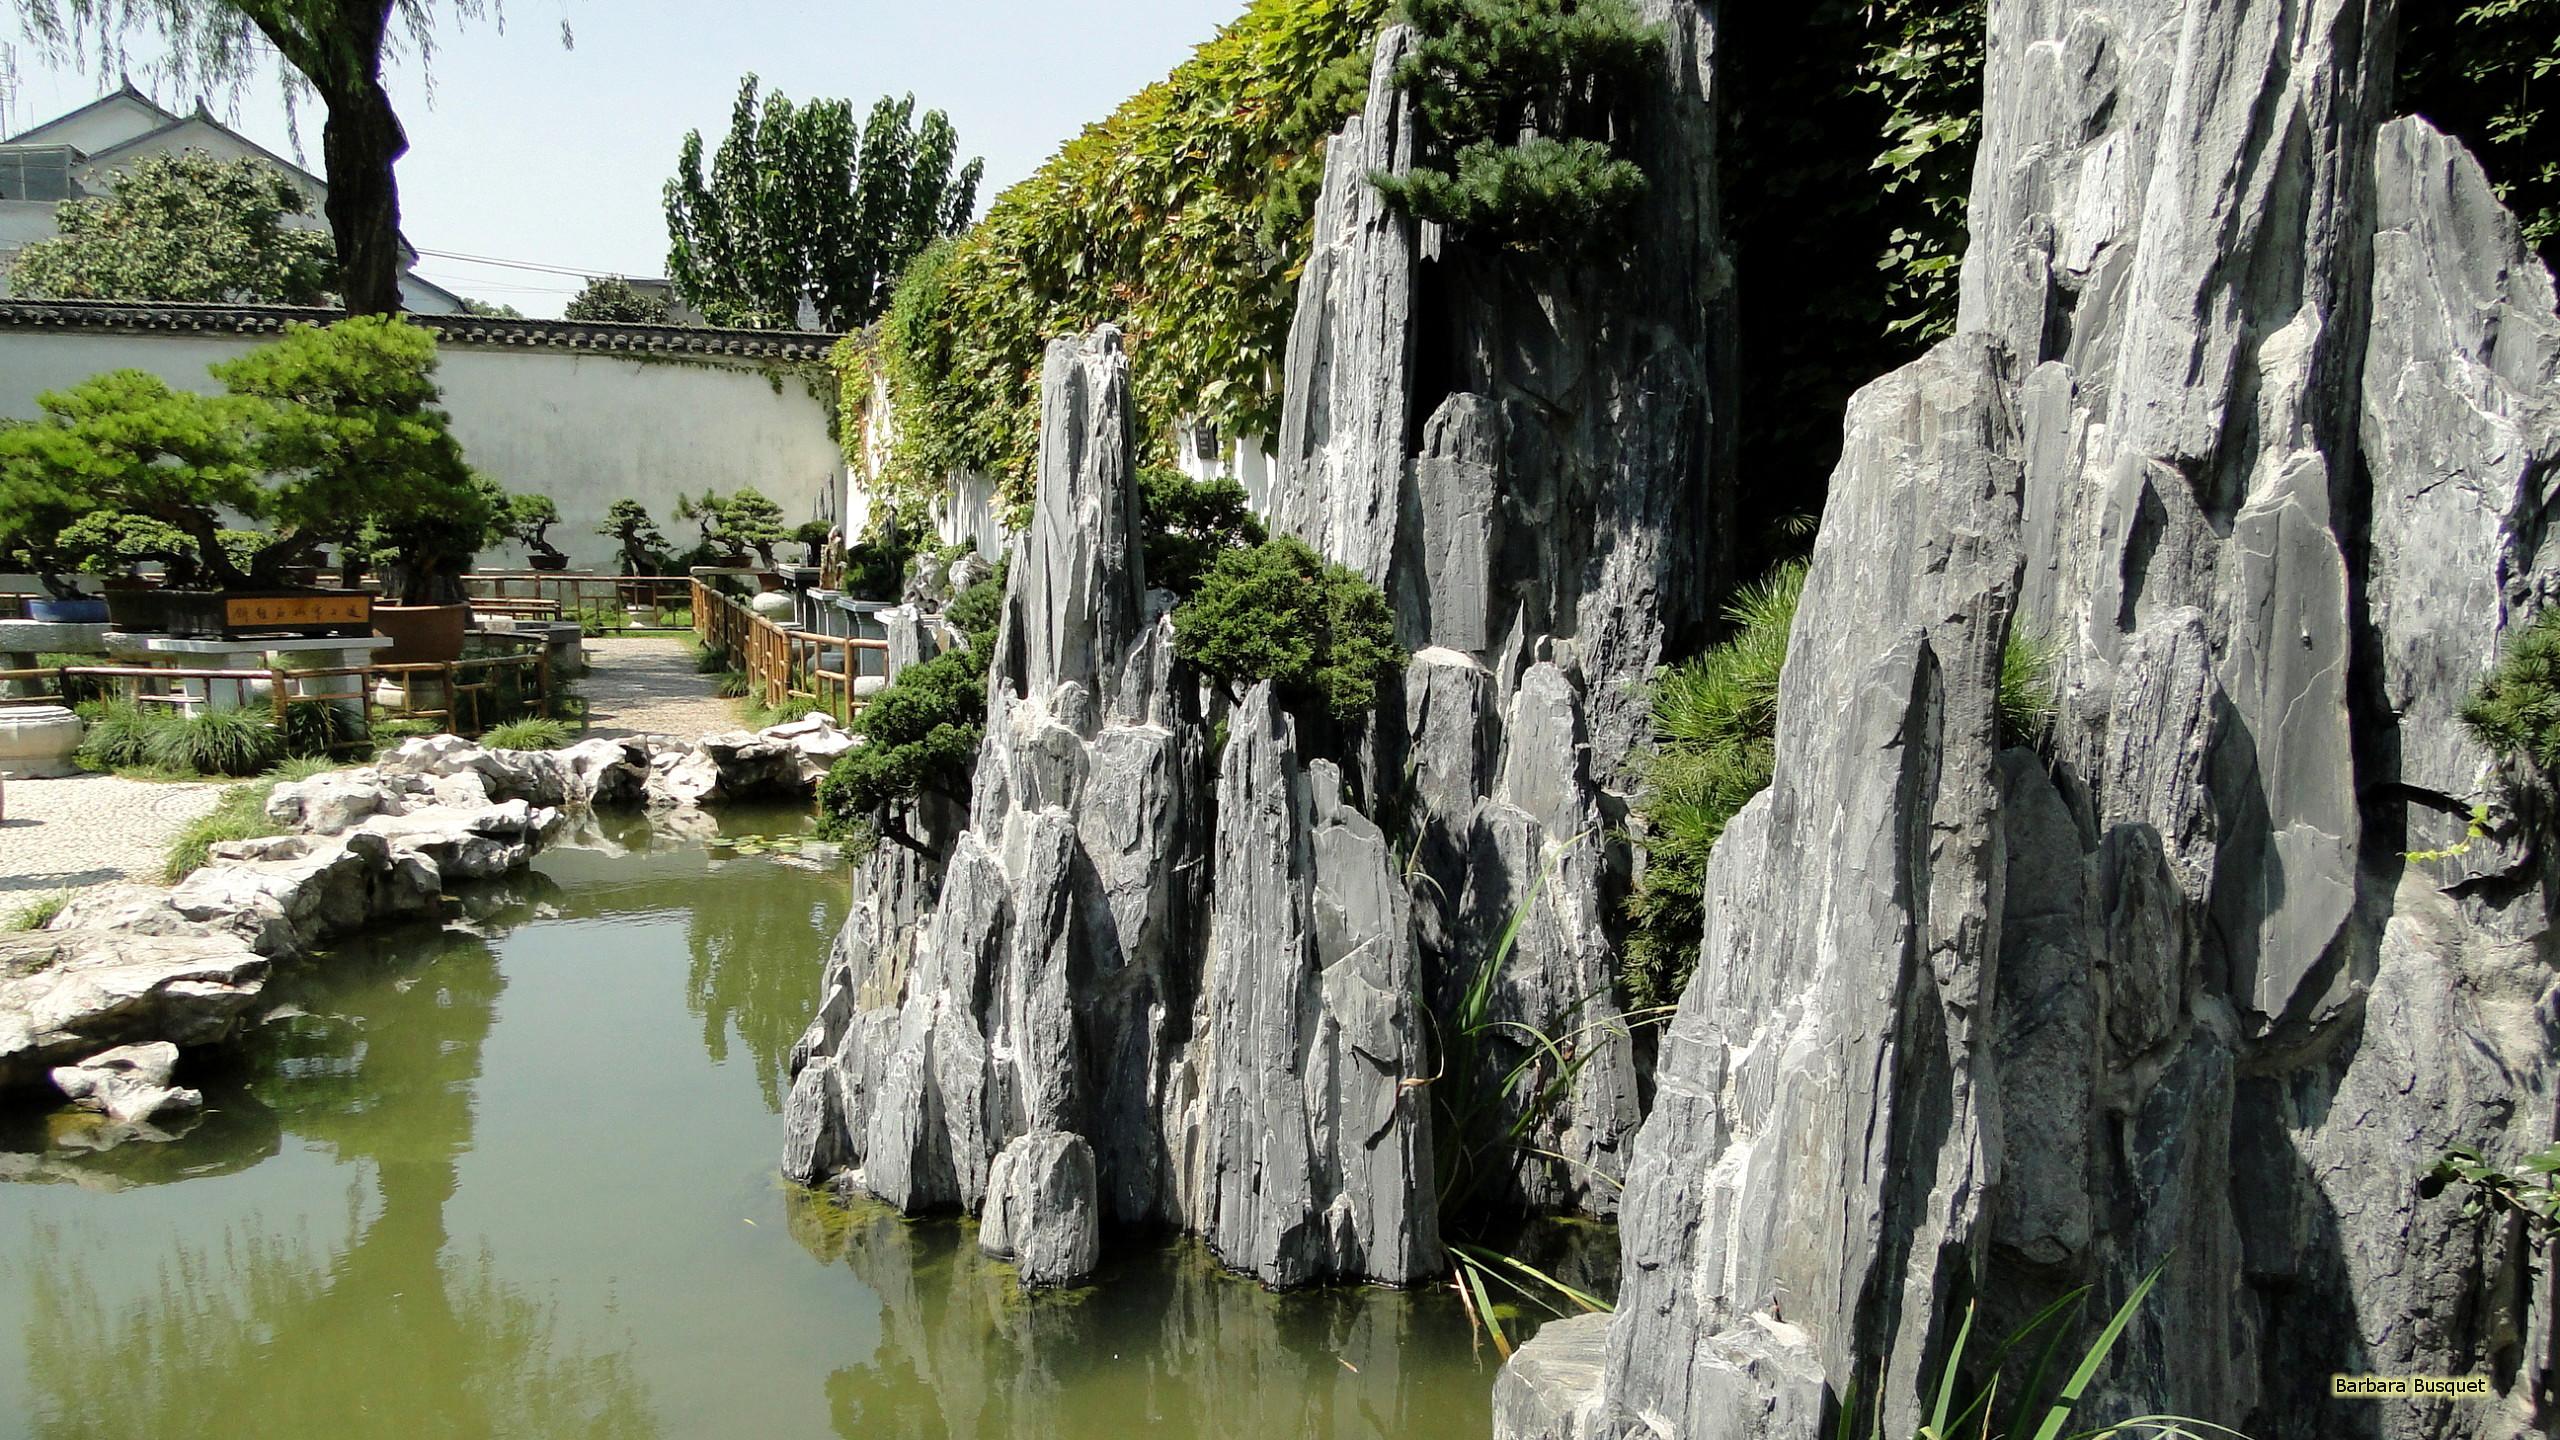 chinese garden wallpaper in hd - photo #19